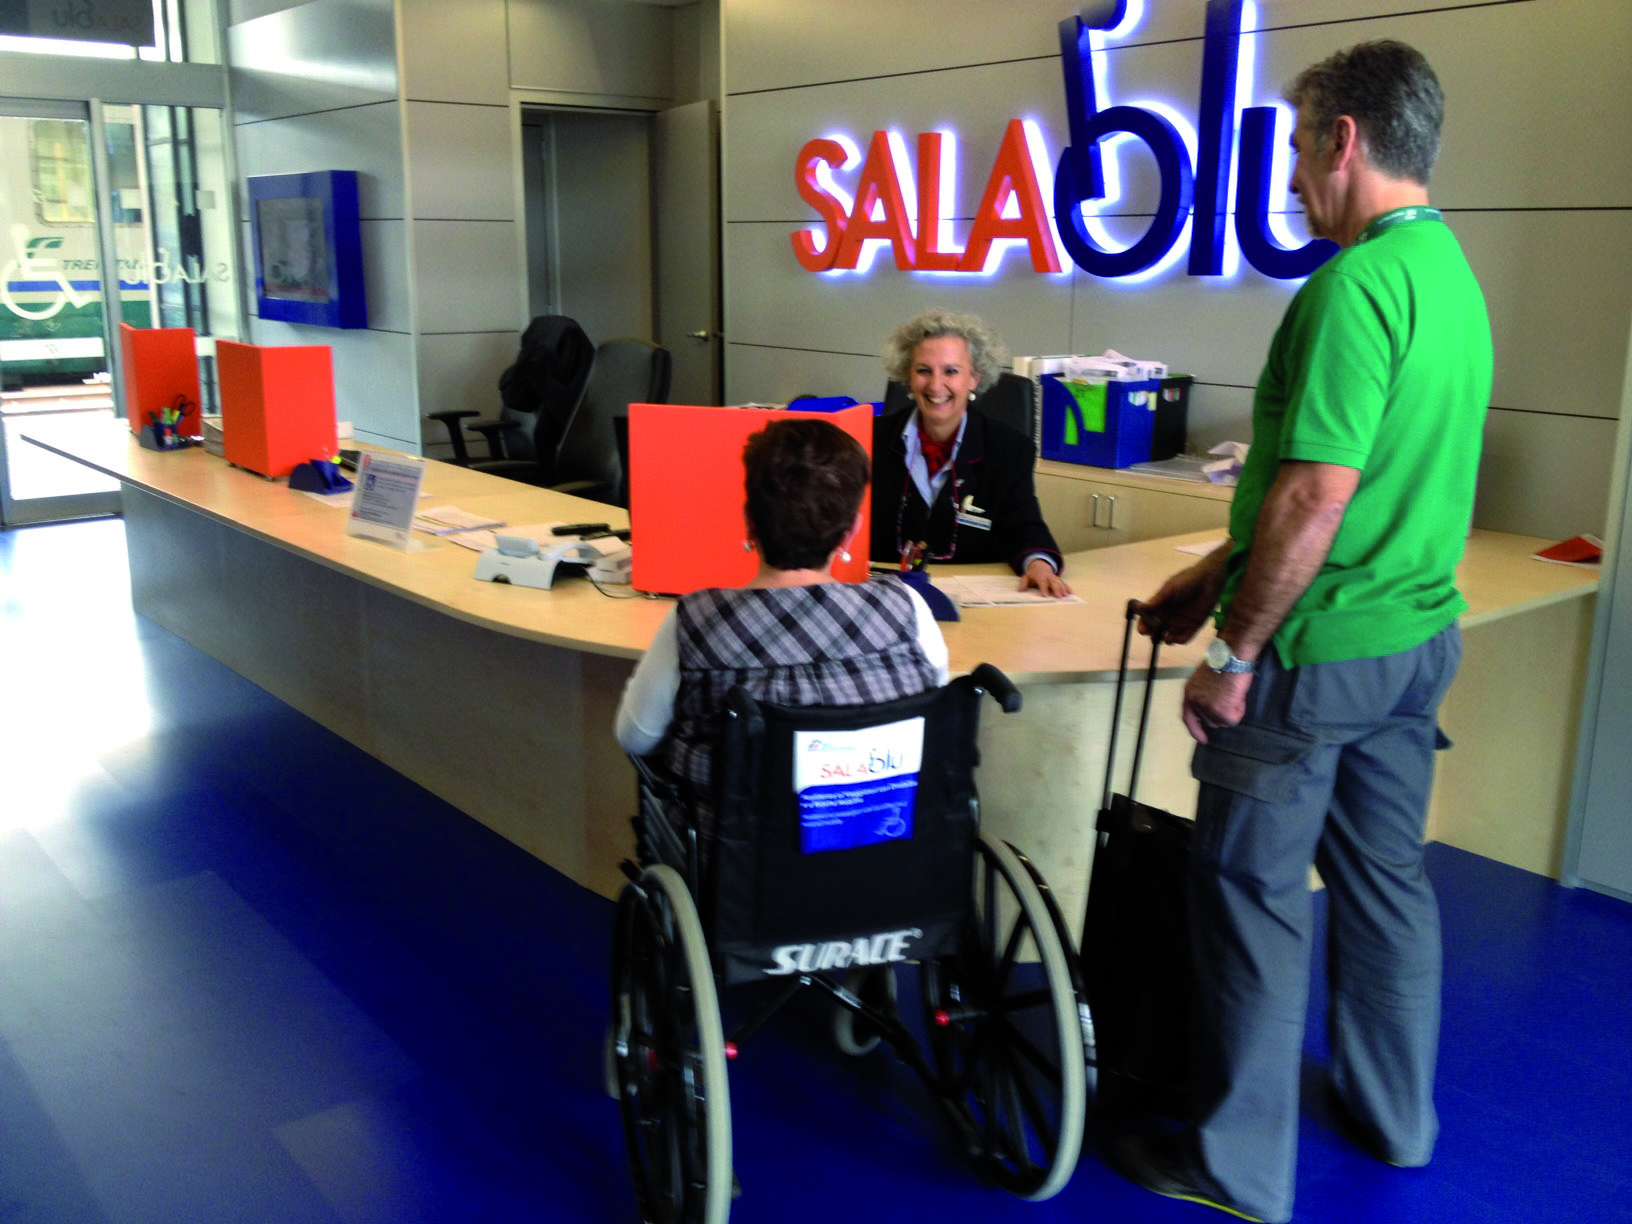 Sala Blu - Assistenza disabili Trenitalia